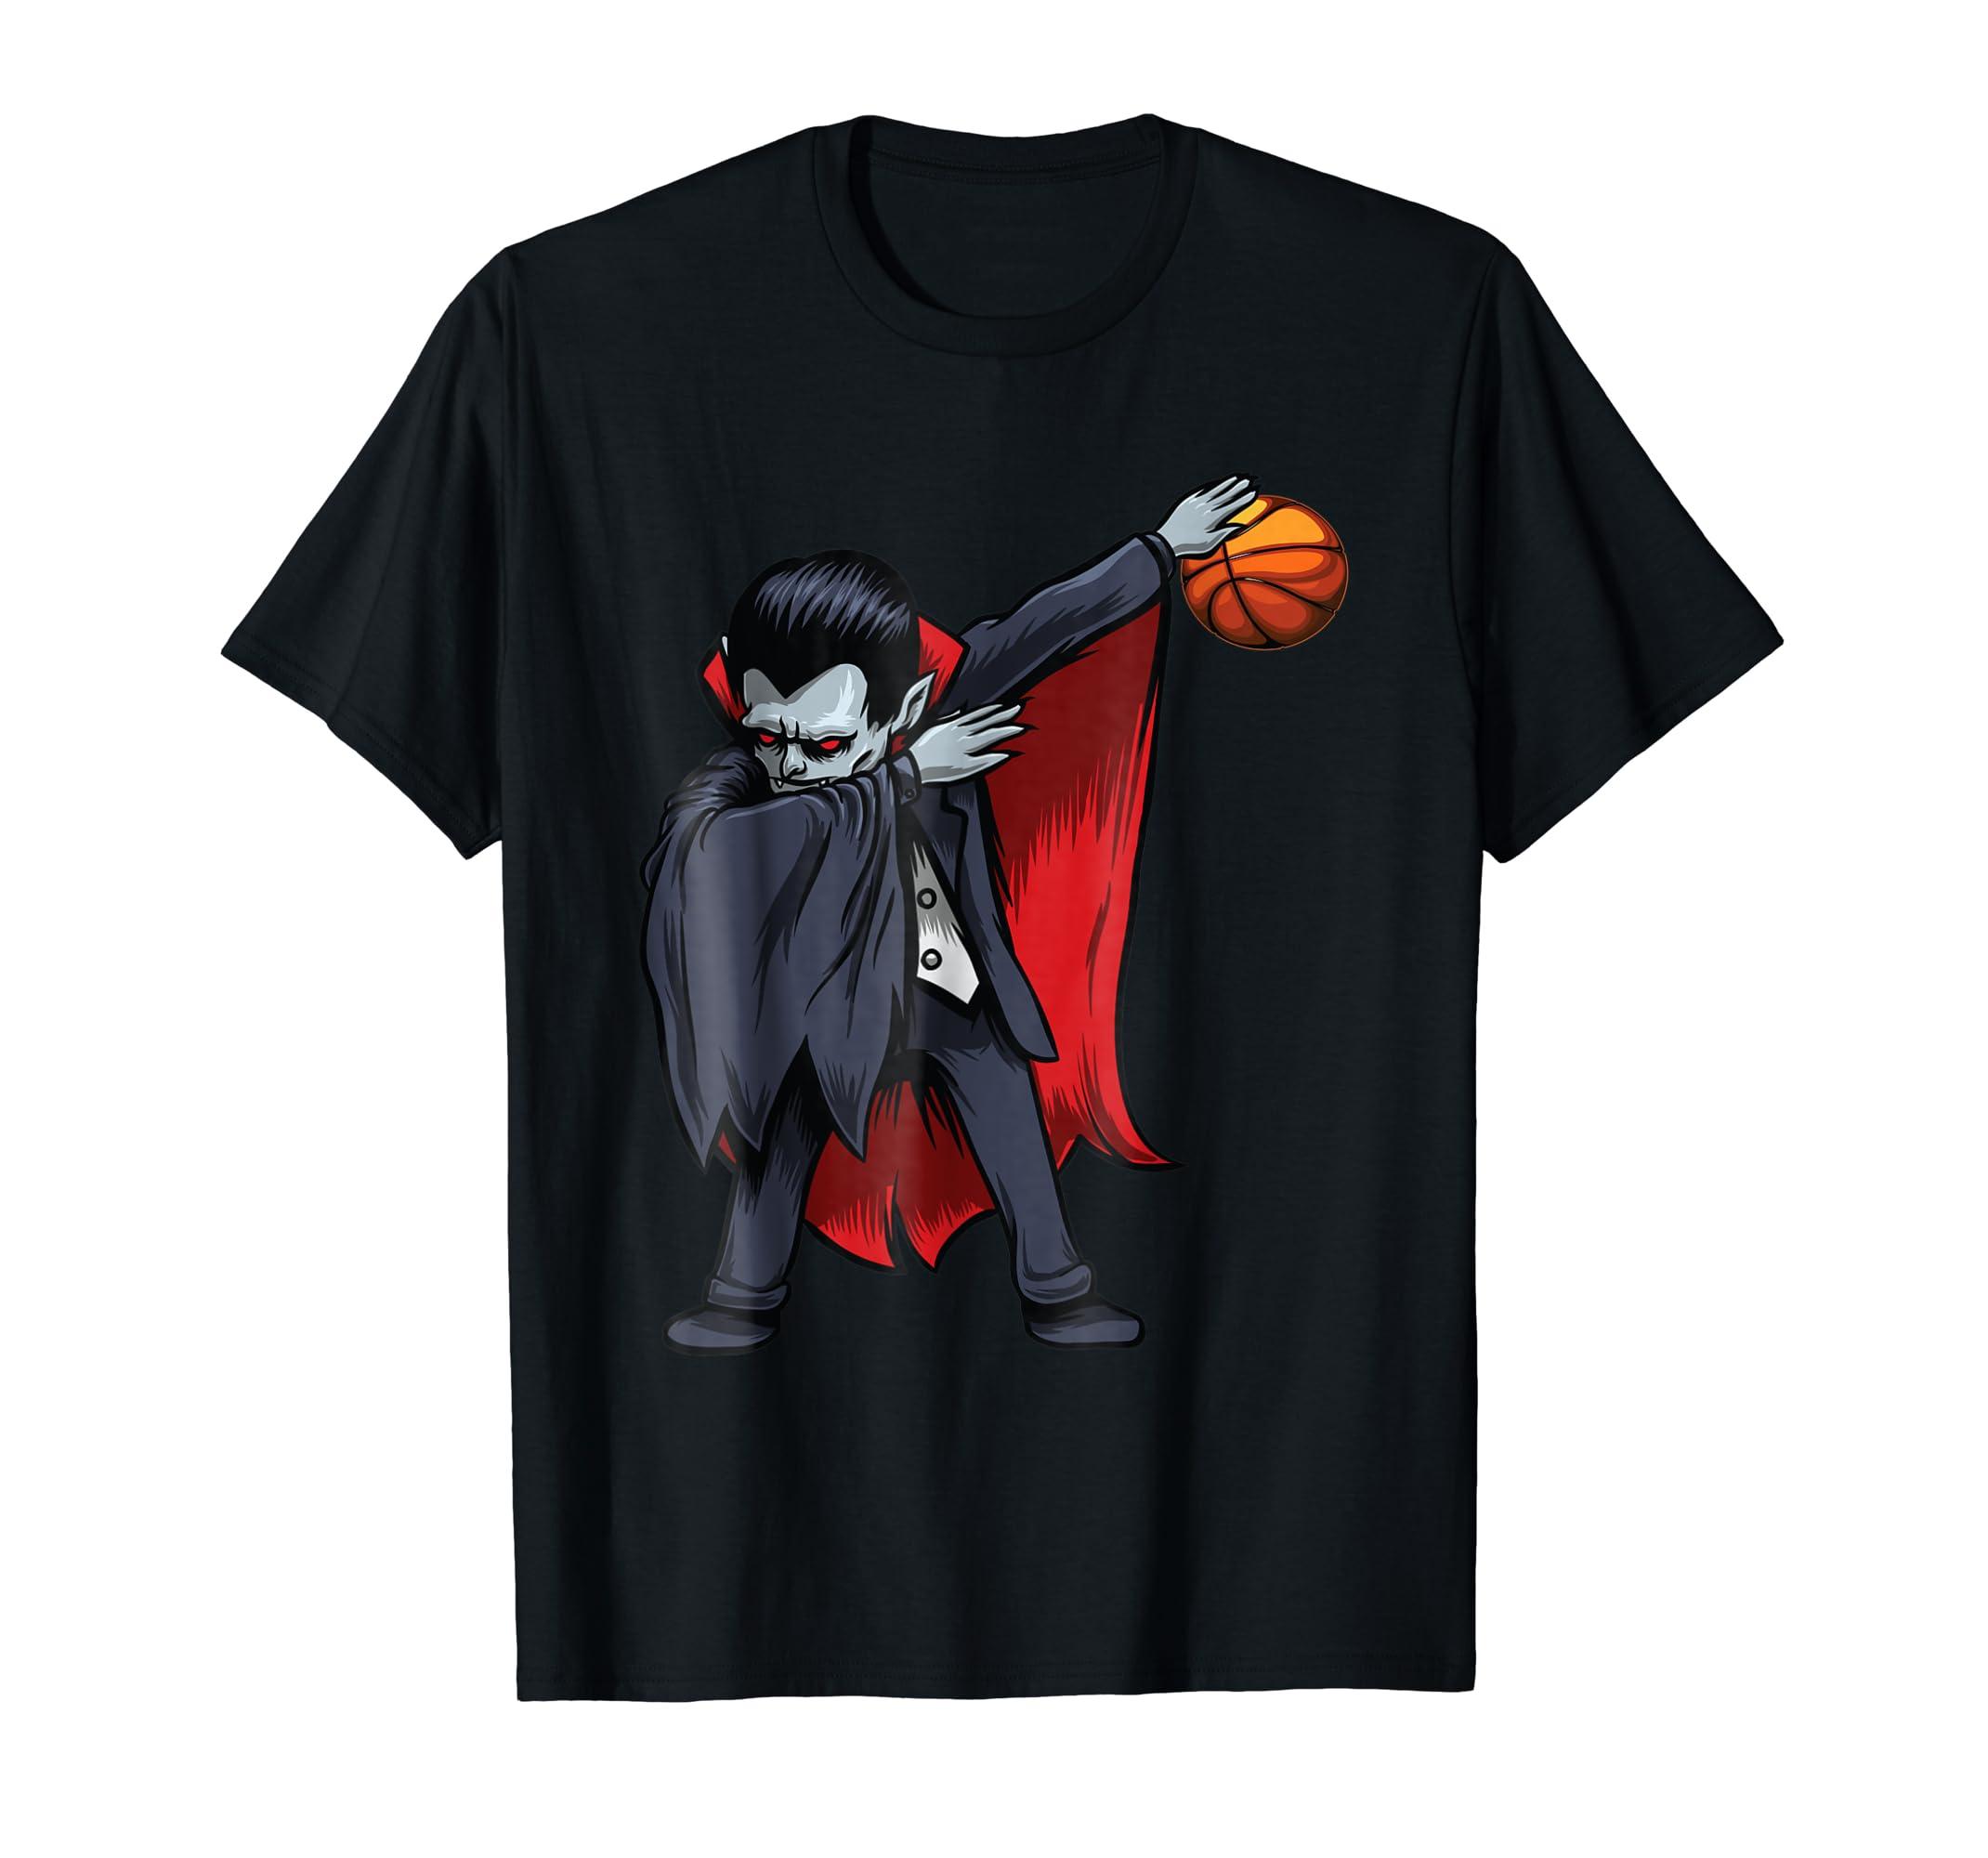 109b4902 Amazon.com: Dabbing Dracula Basketball T-Shirt Funny Halloween Dab Kids:  Clothing